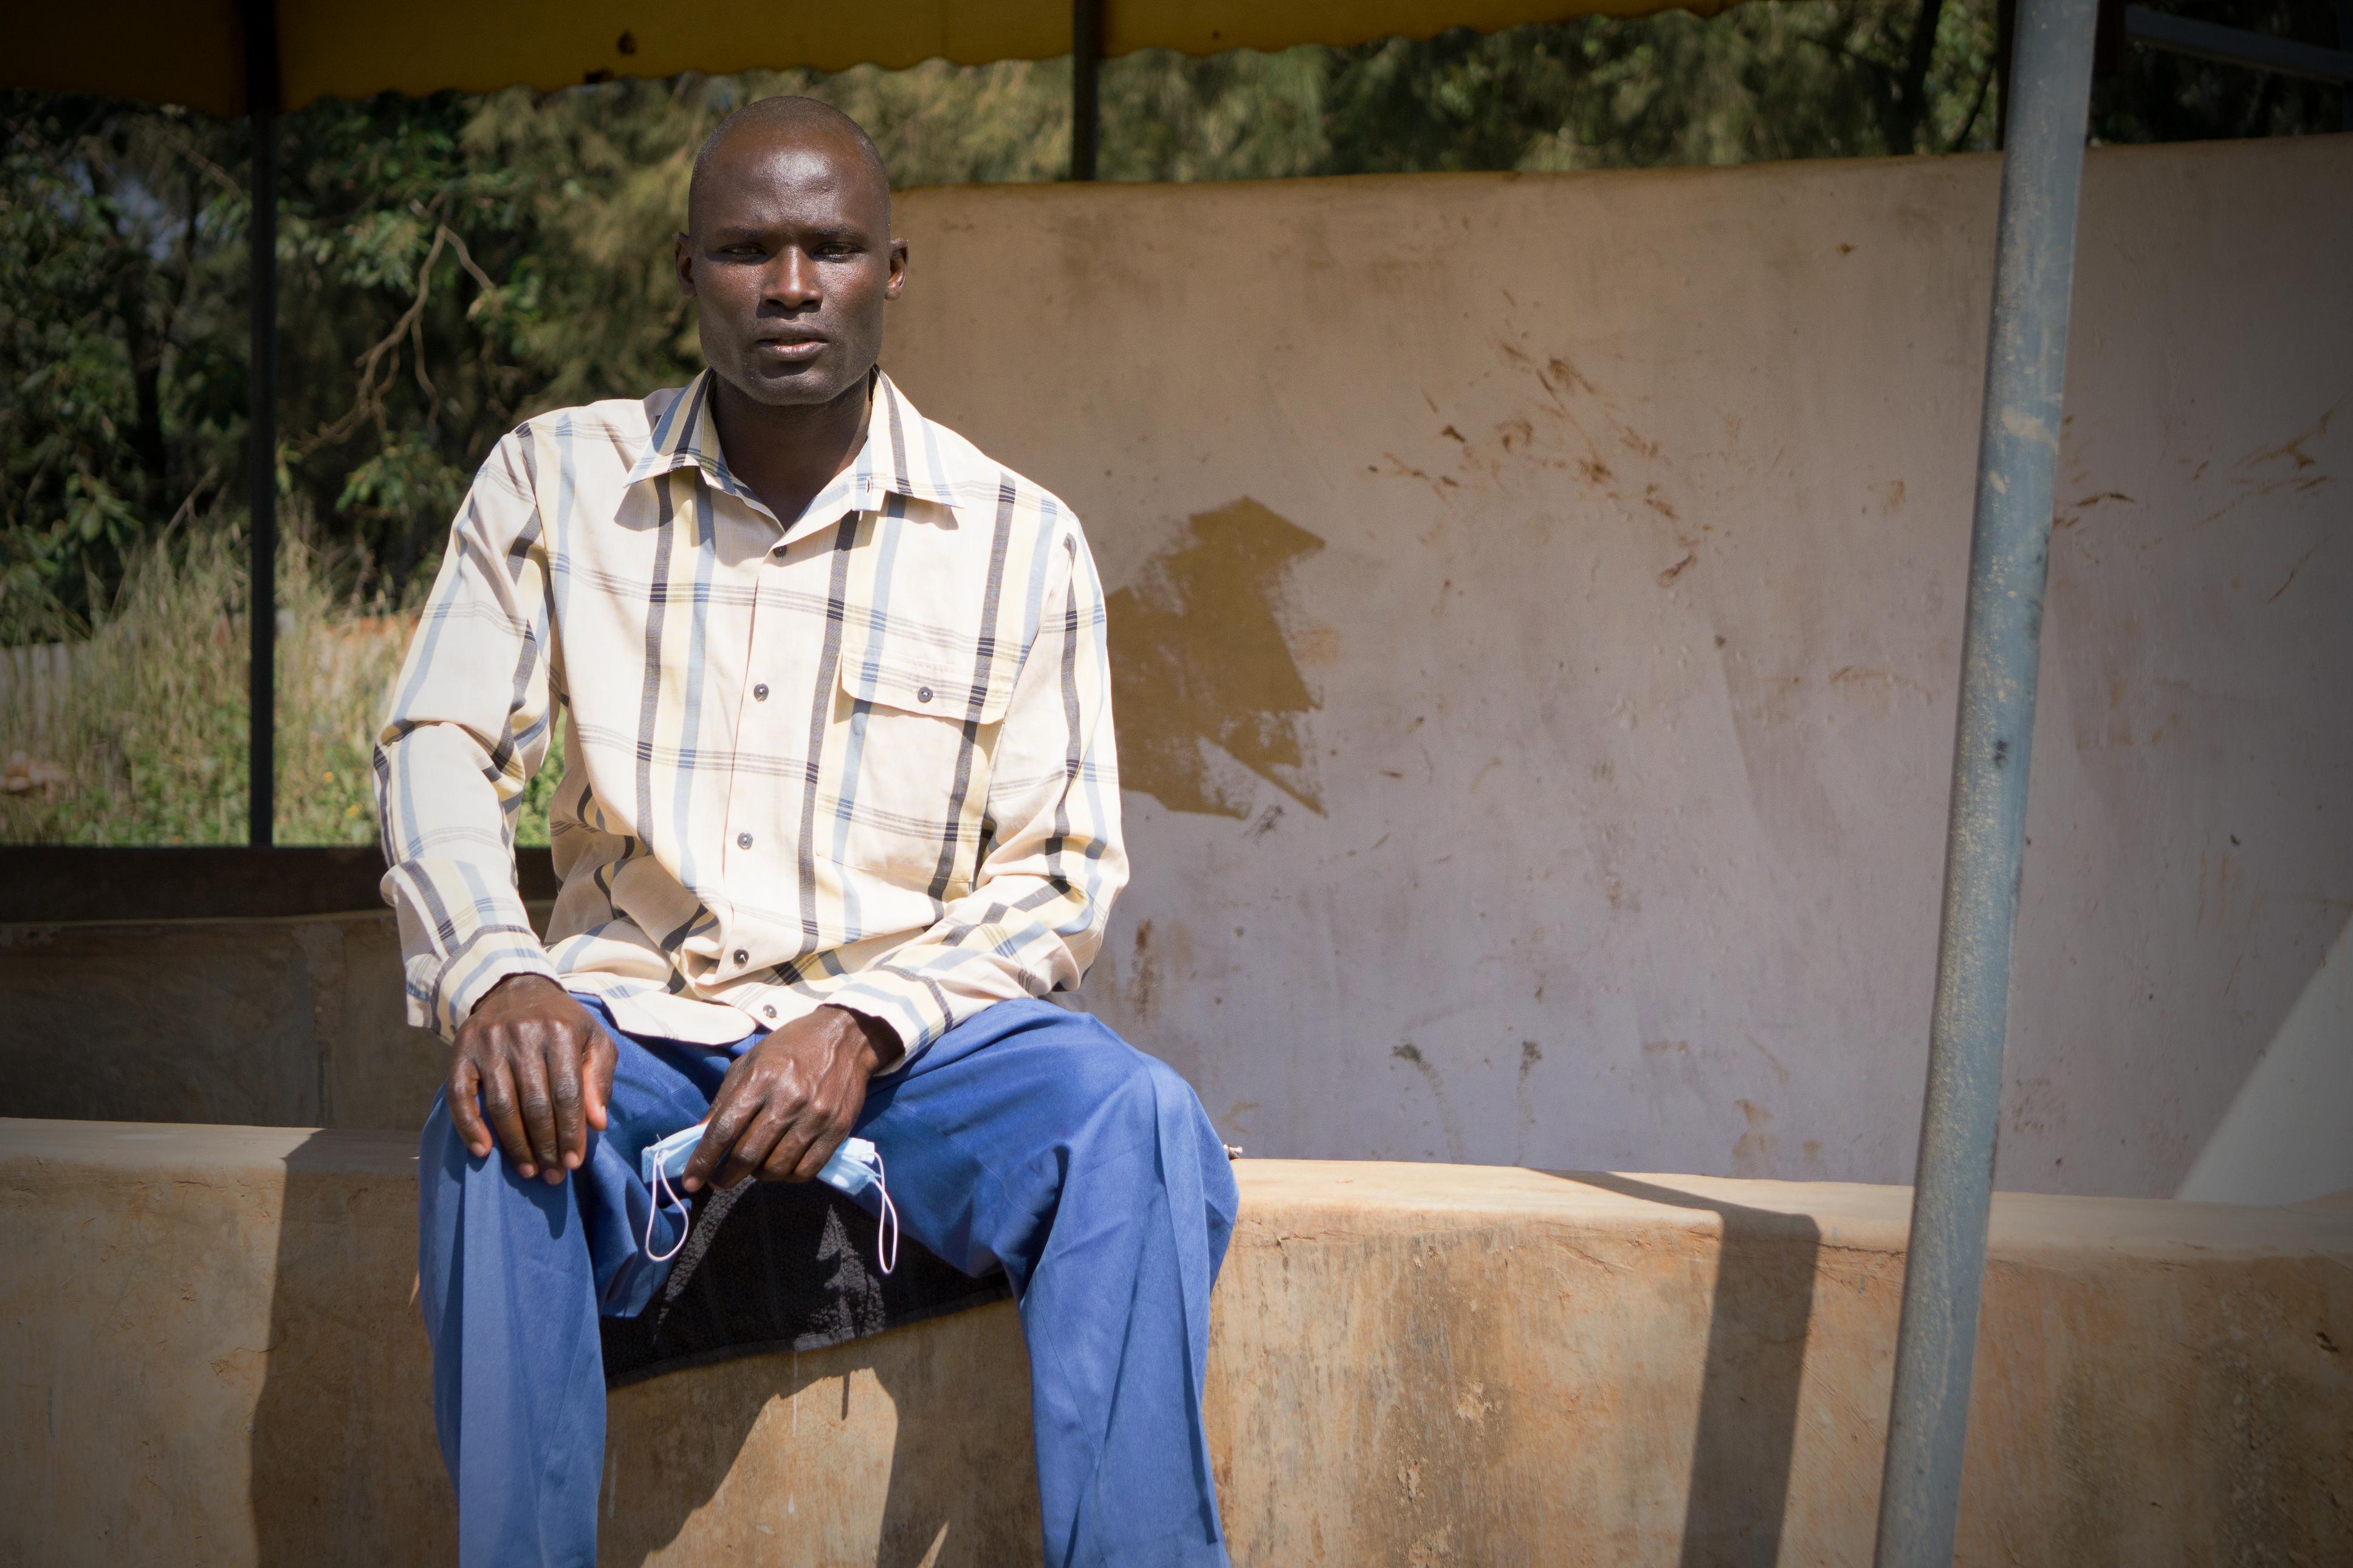 Evans Mugambi